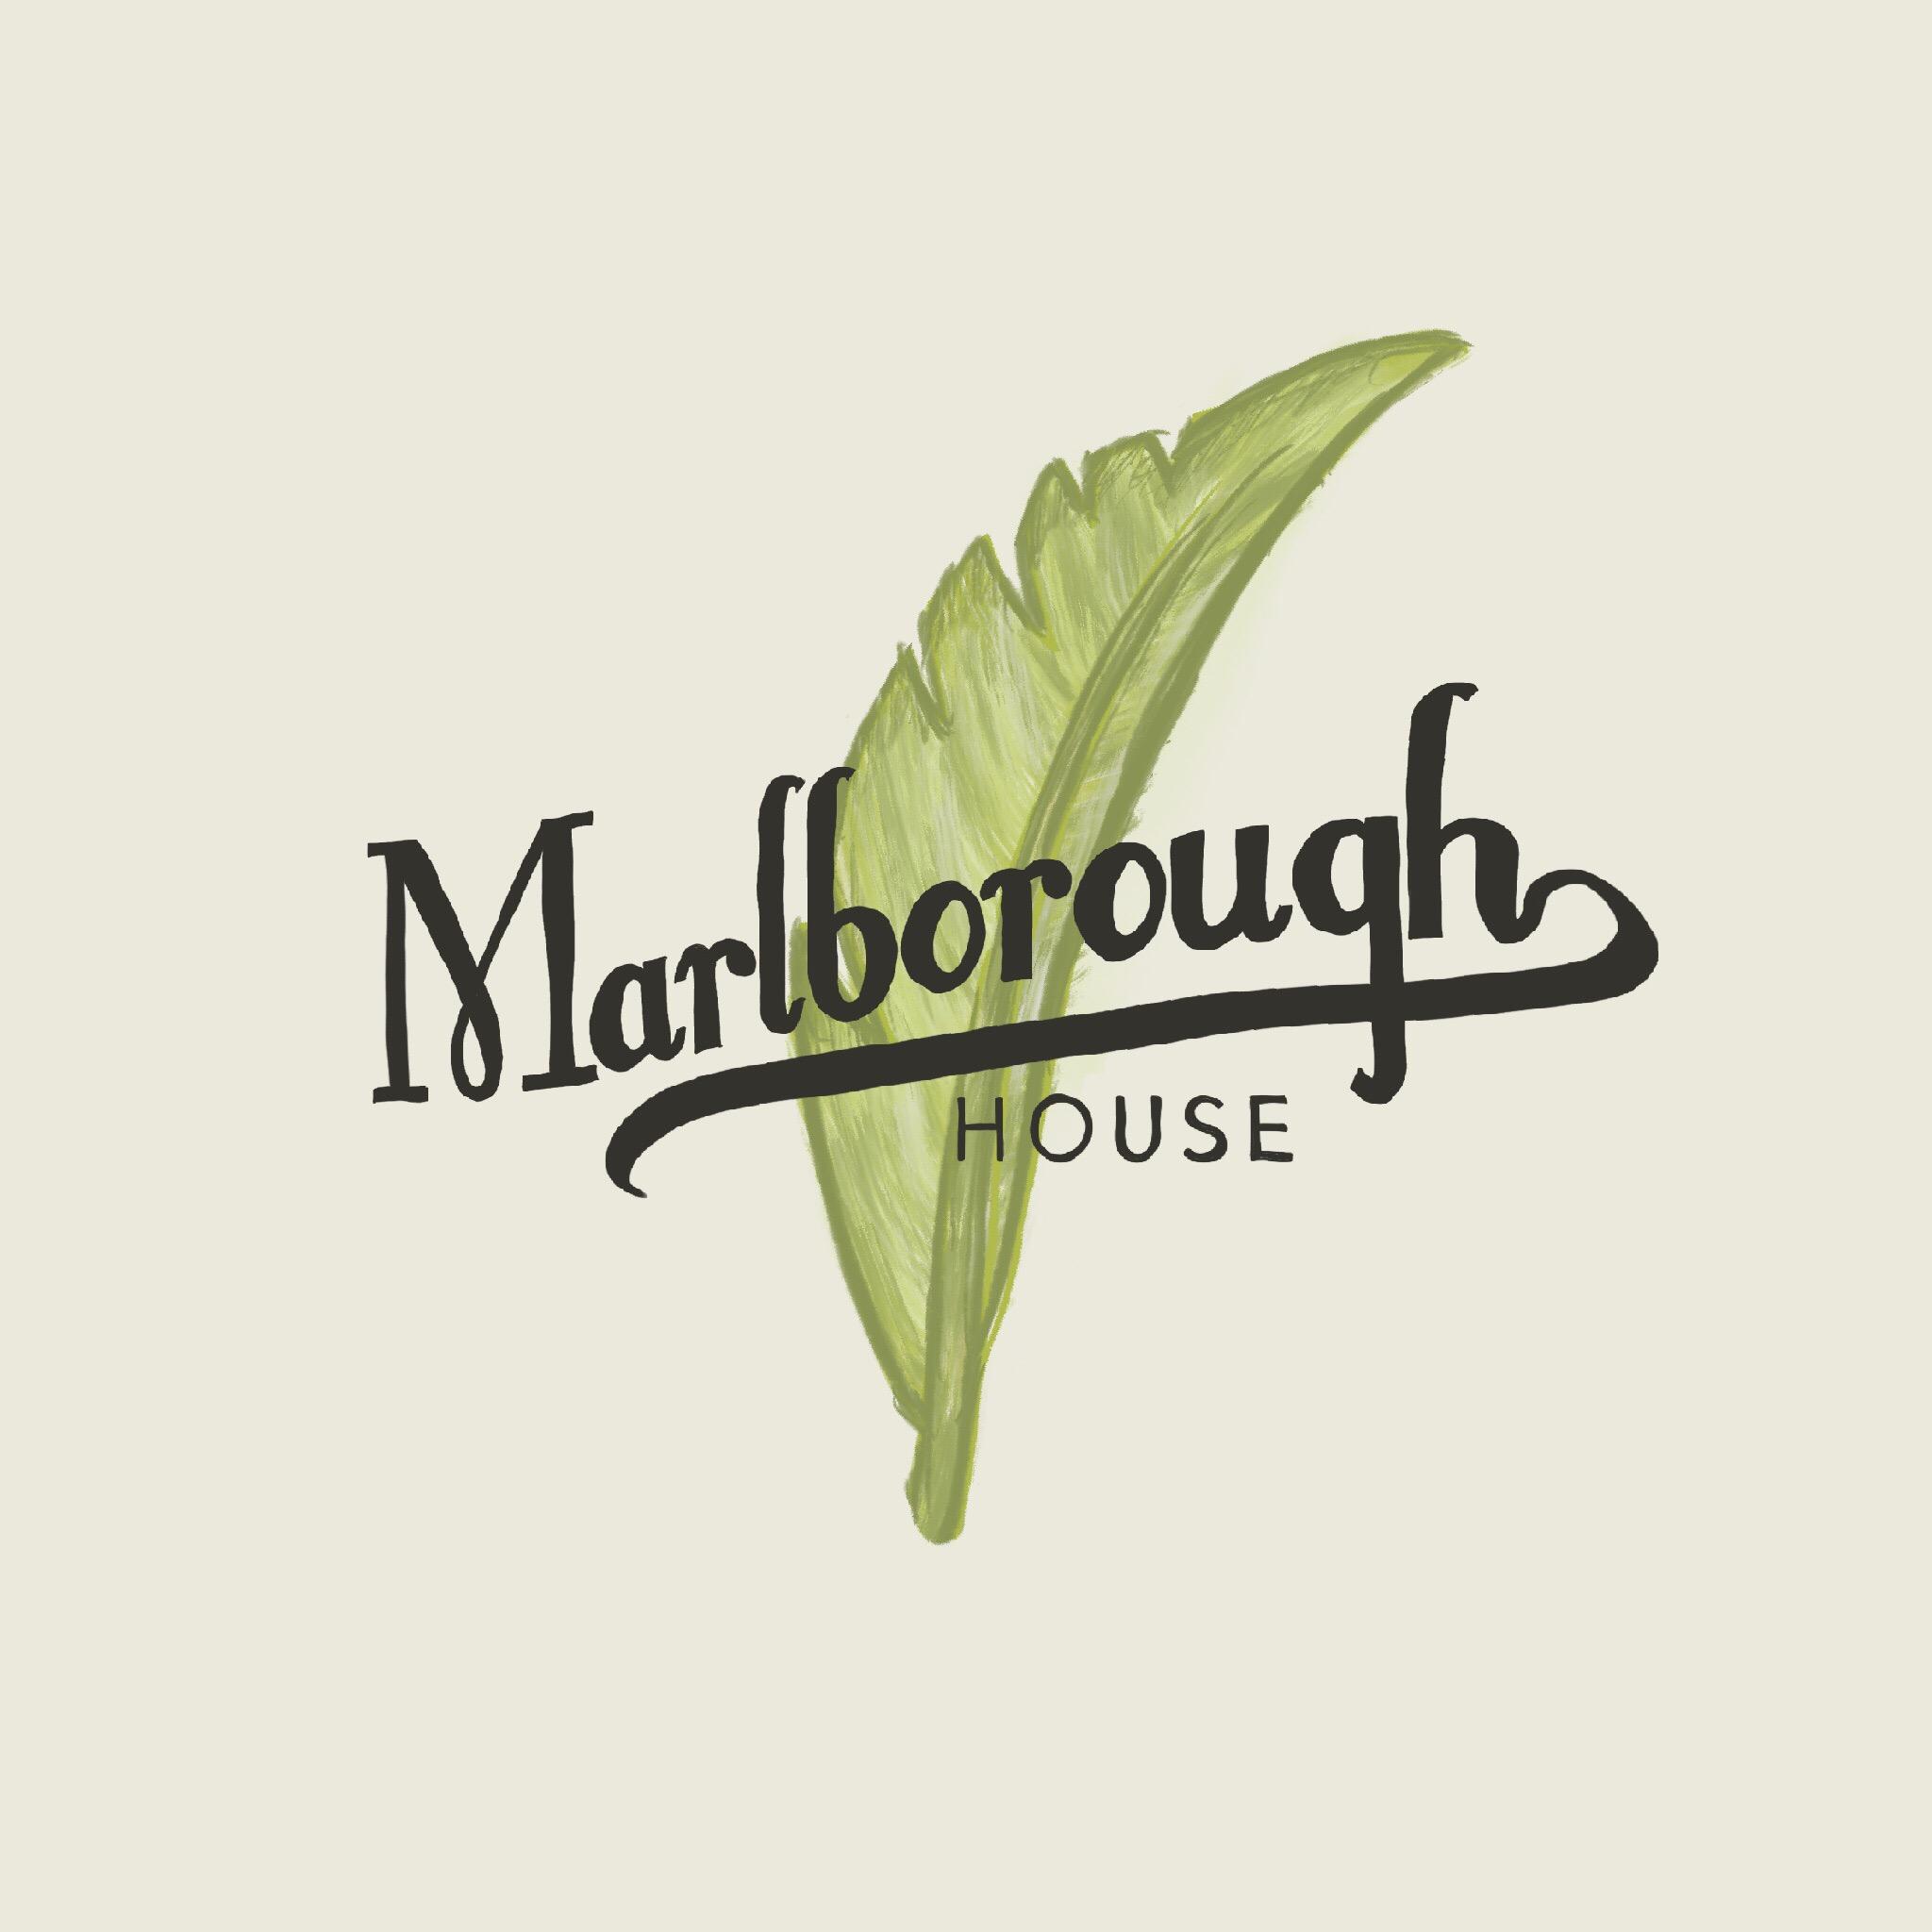 03 Marlborough House.JPG